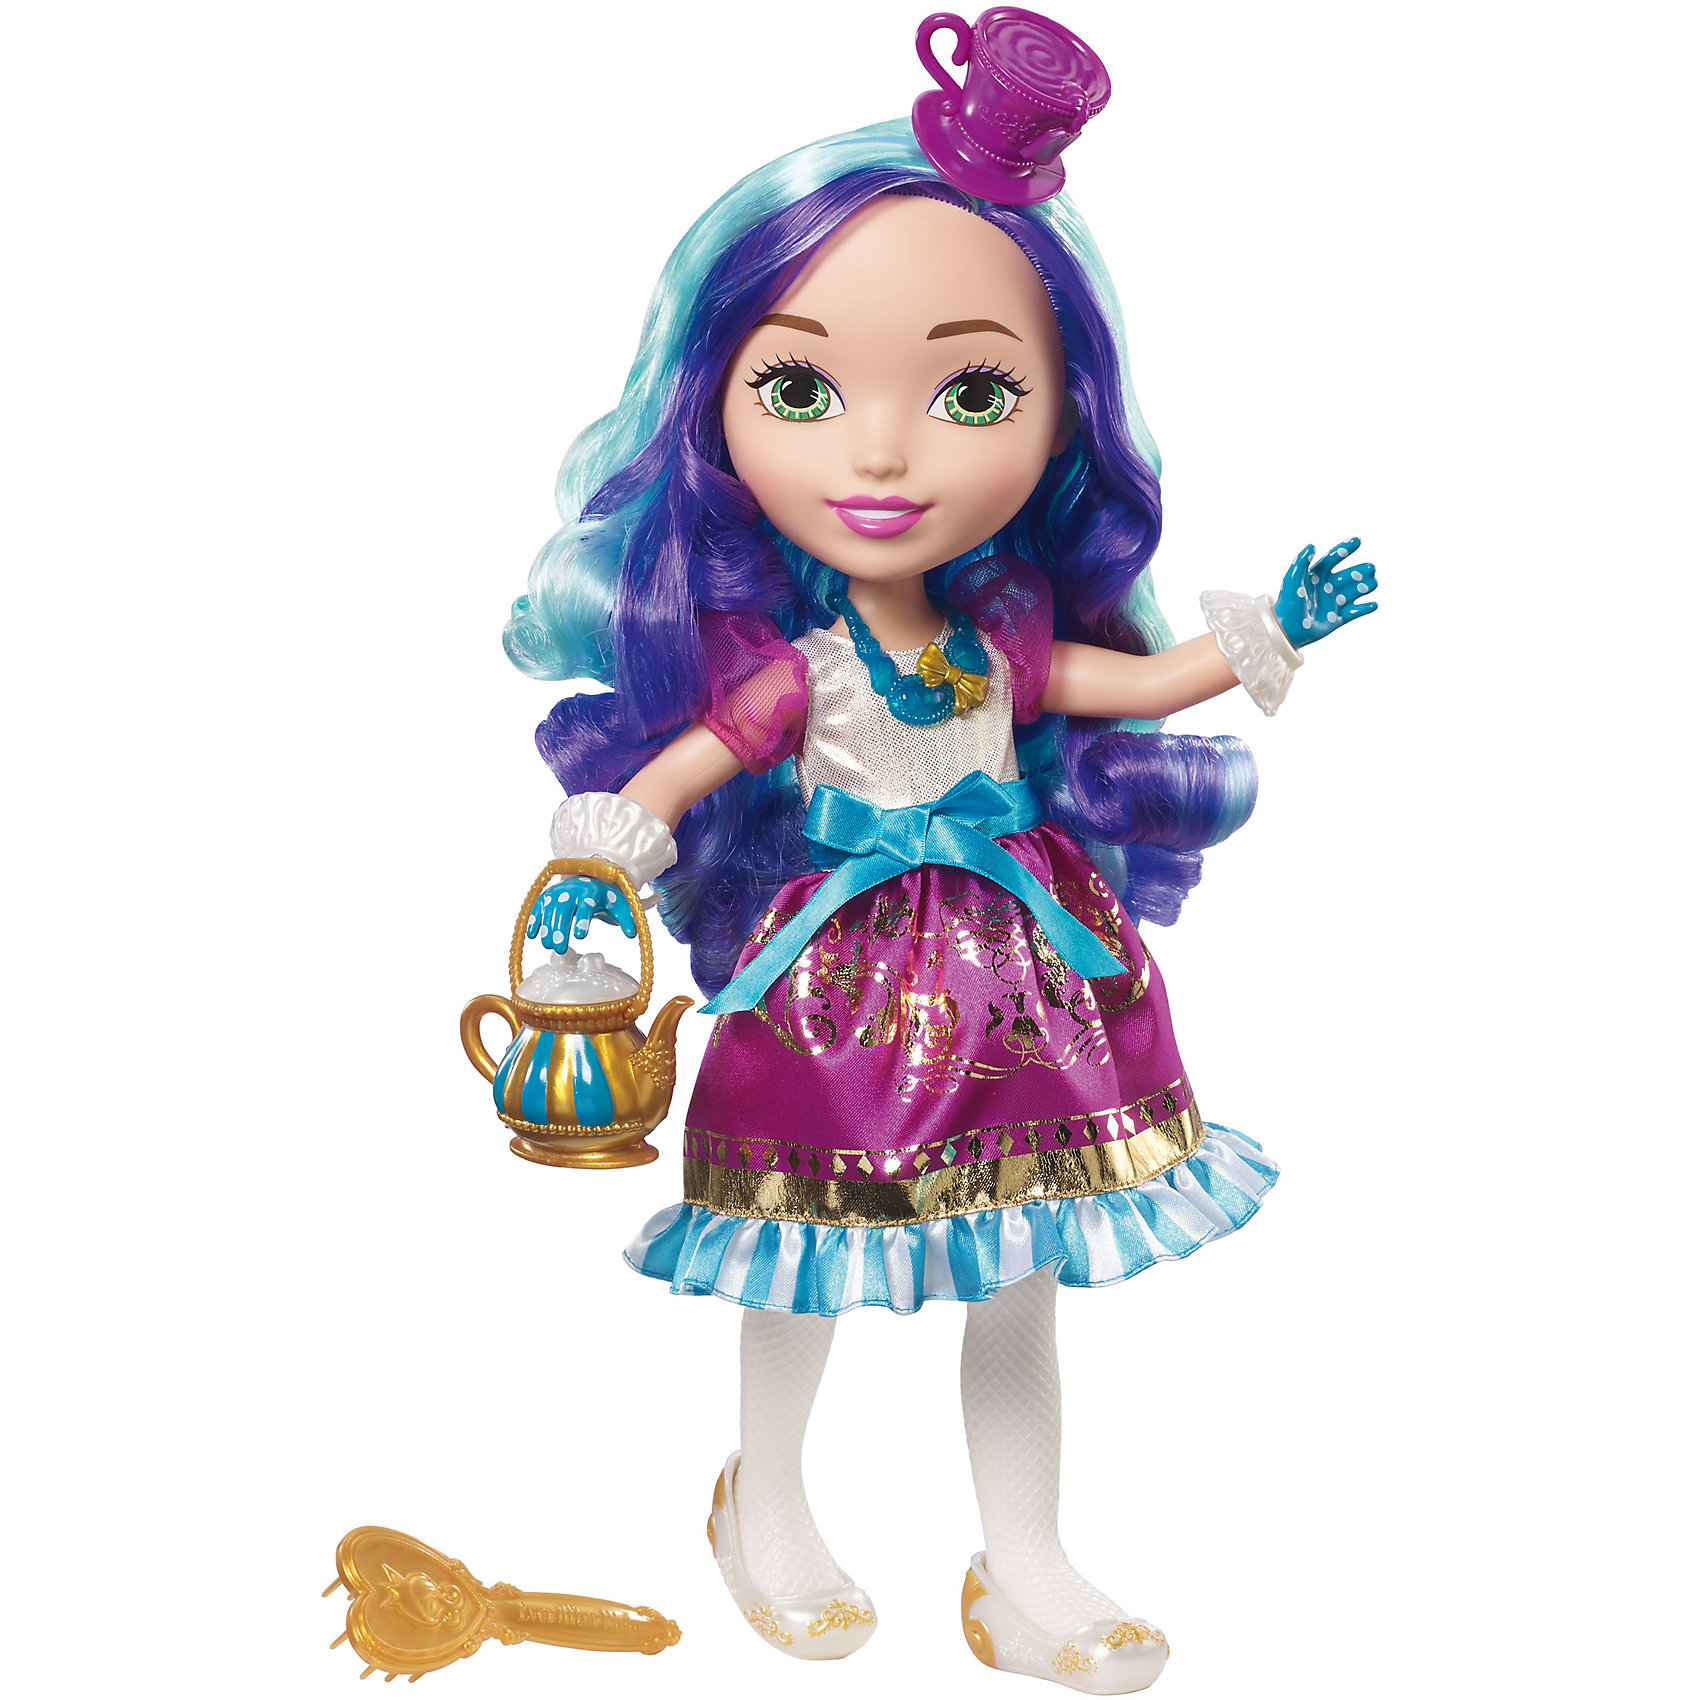 Большая  кукла принцесса Мэдлин Хэттер, Ever After HighКуклы-модели<br><br><br>Ширина мм: 205<br>Глубина мм: 110<br>Высота мм: 380<br>Вес г: 734<br>Возраст от месяцев: 36<br>Возраст до месяцев: 120<br>Пол: Женский<br>Возраст: Детский<br>SKU: 6673371